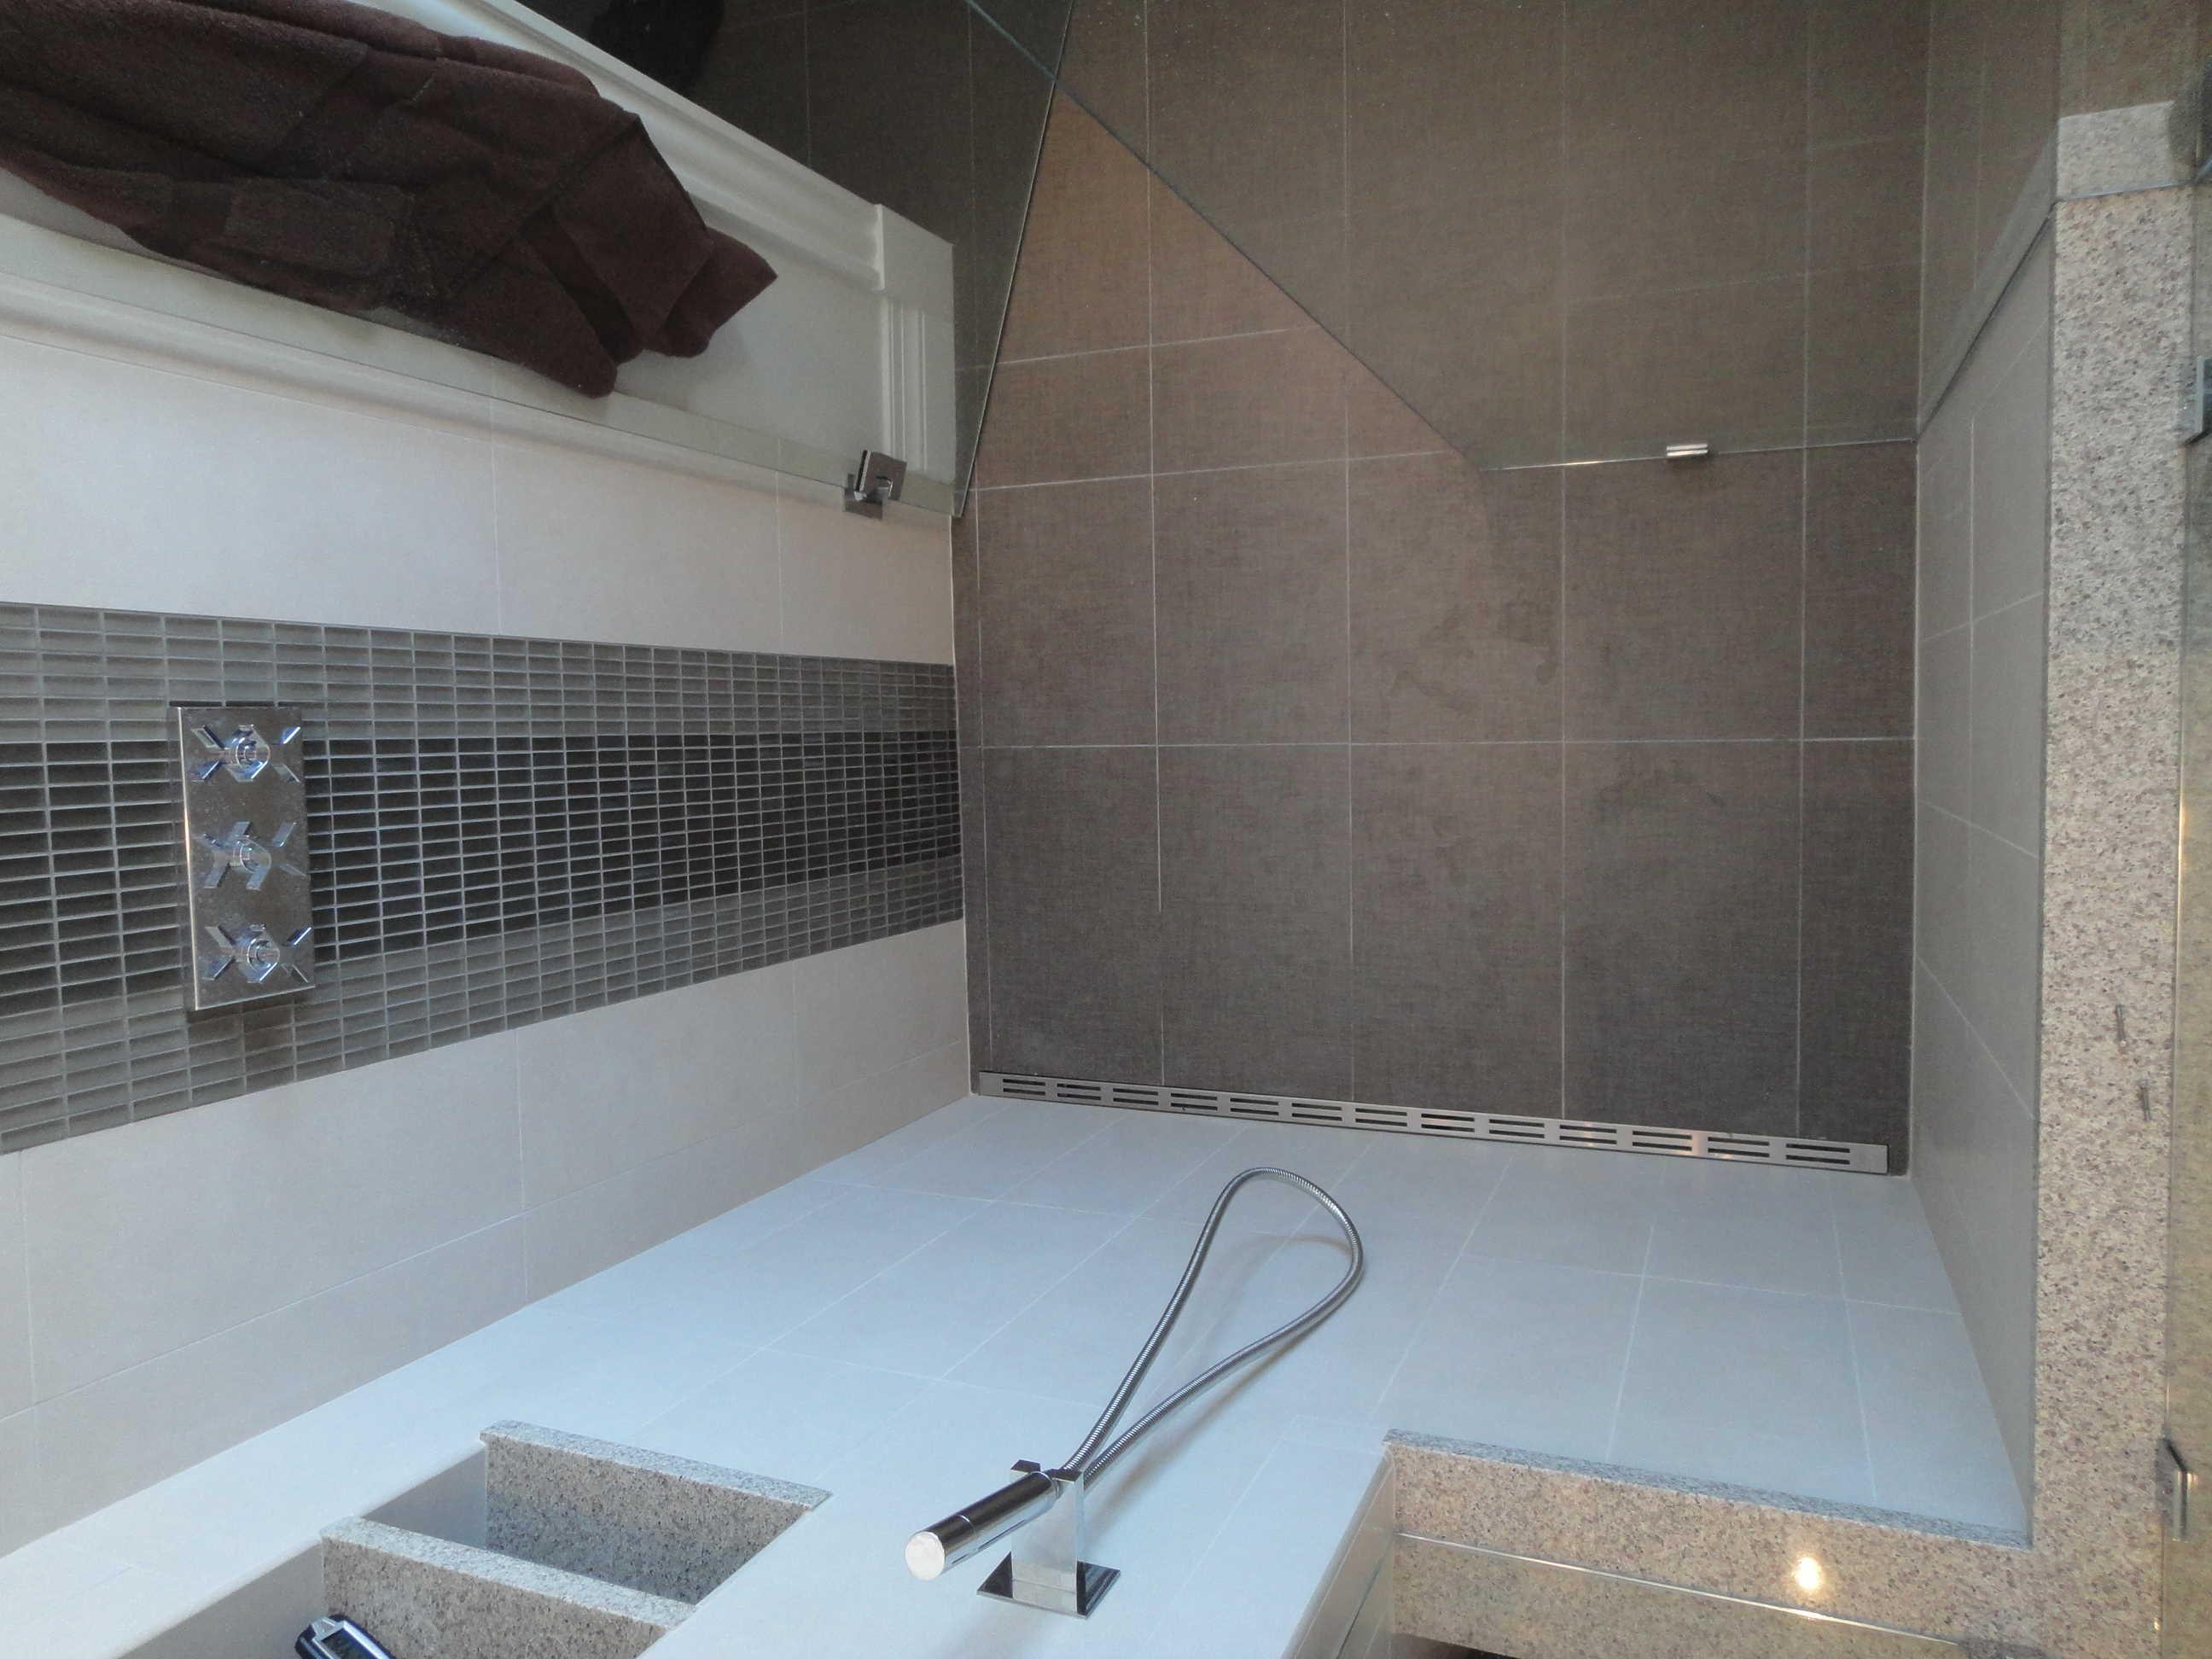 Tiled Shower Quickdrain Proline Linear Drains